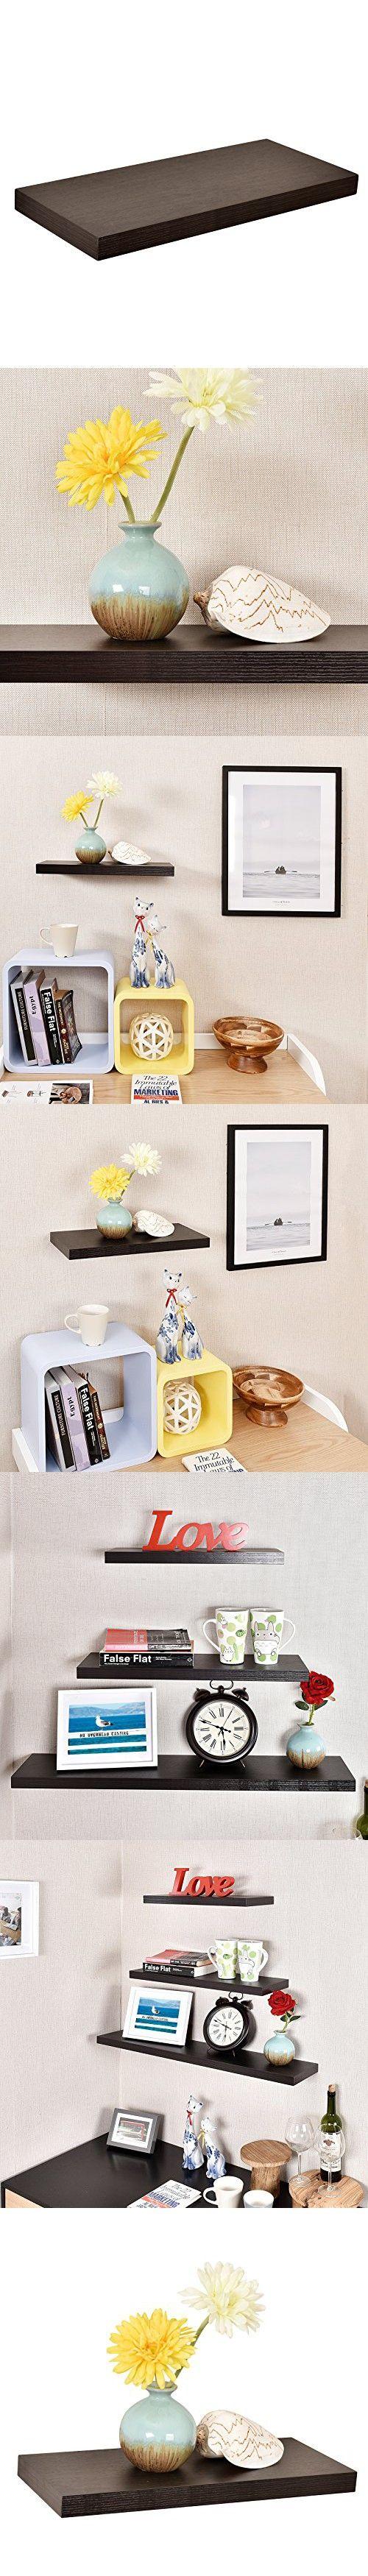 317 best floating shelves images on pinterest floating shelves welland simons floating wall shelf 18 inch espresso amipublicfo Choice Image